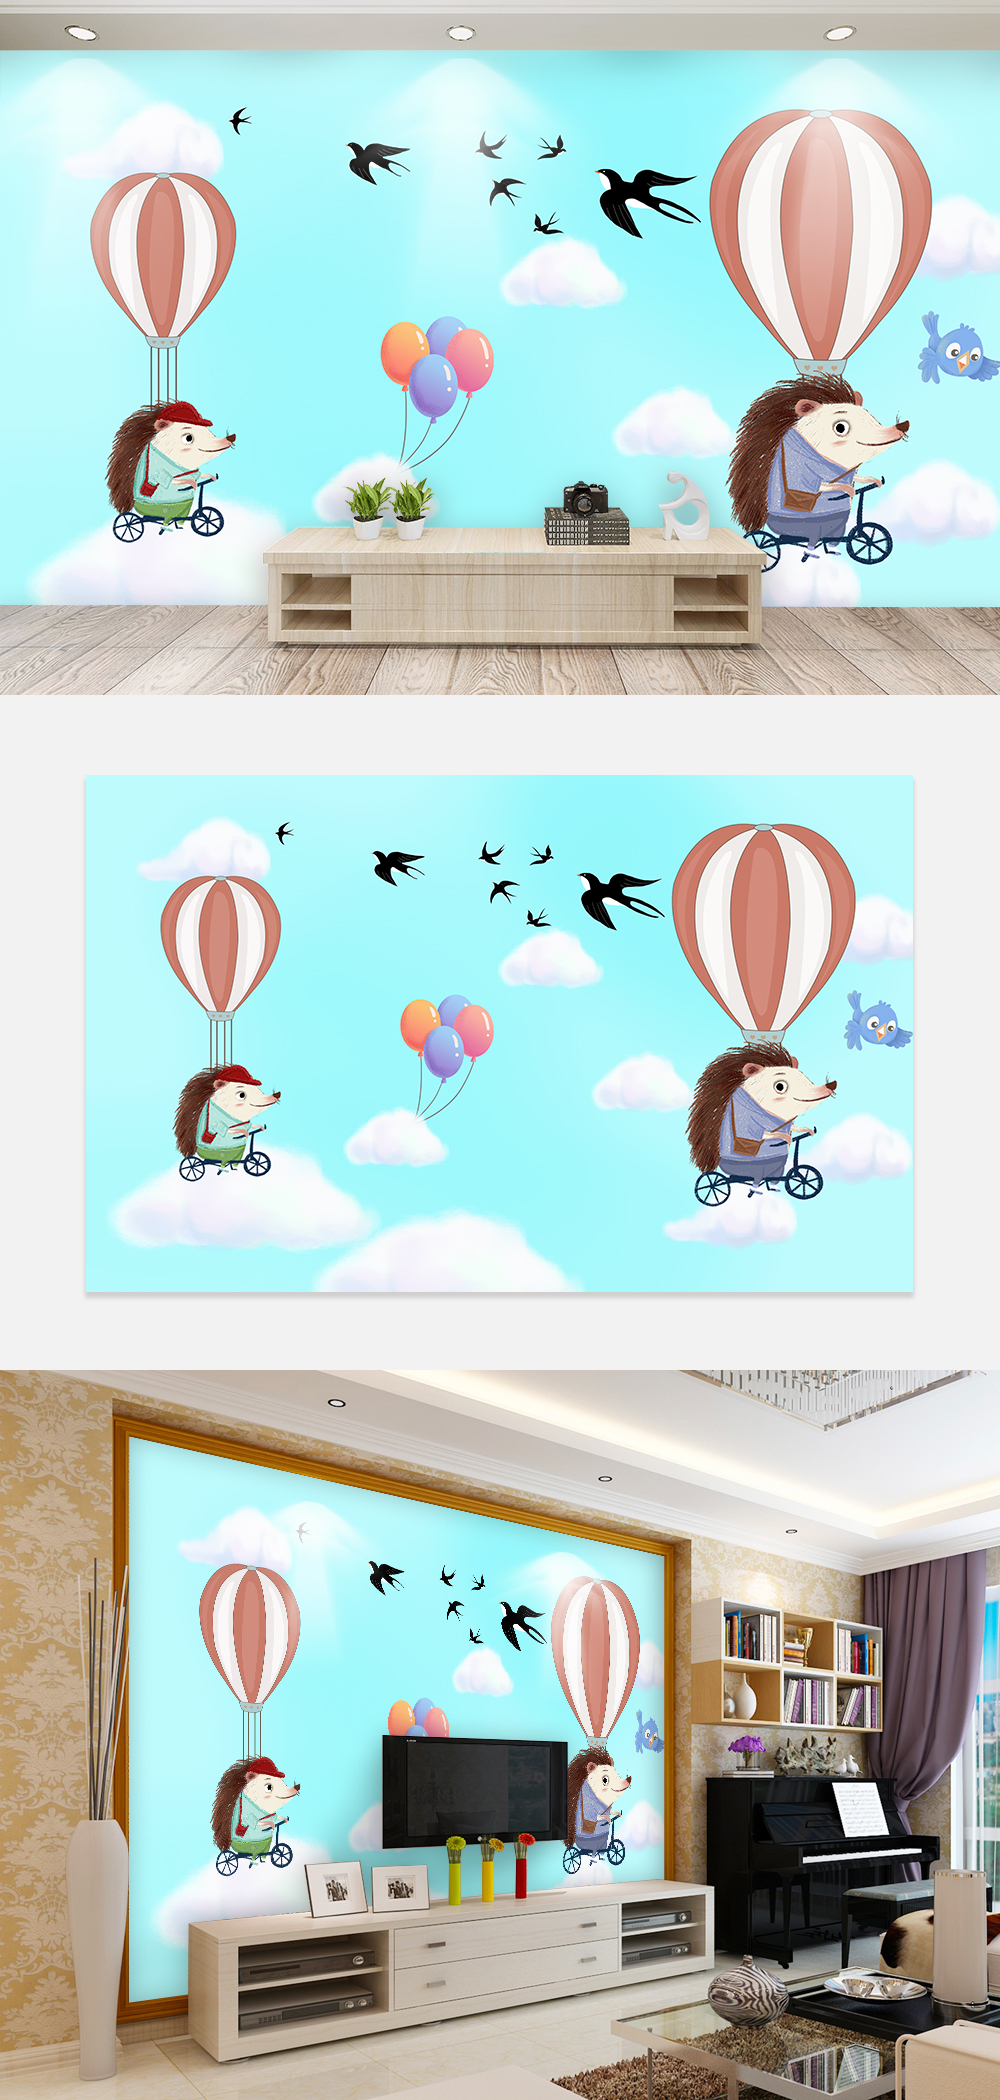 Kartun Anak Anak Kamar Wallpaper Dinding Latar Belakang